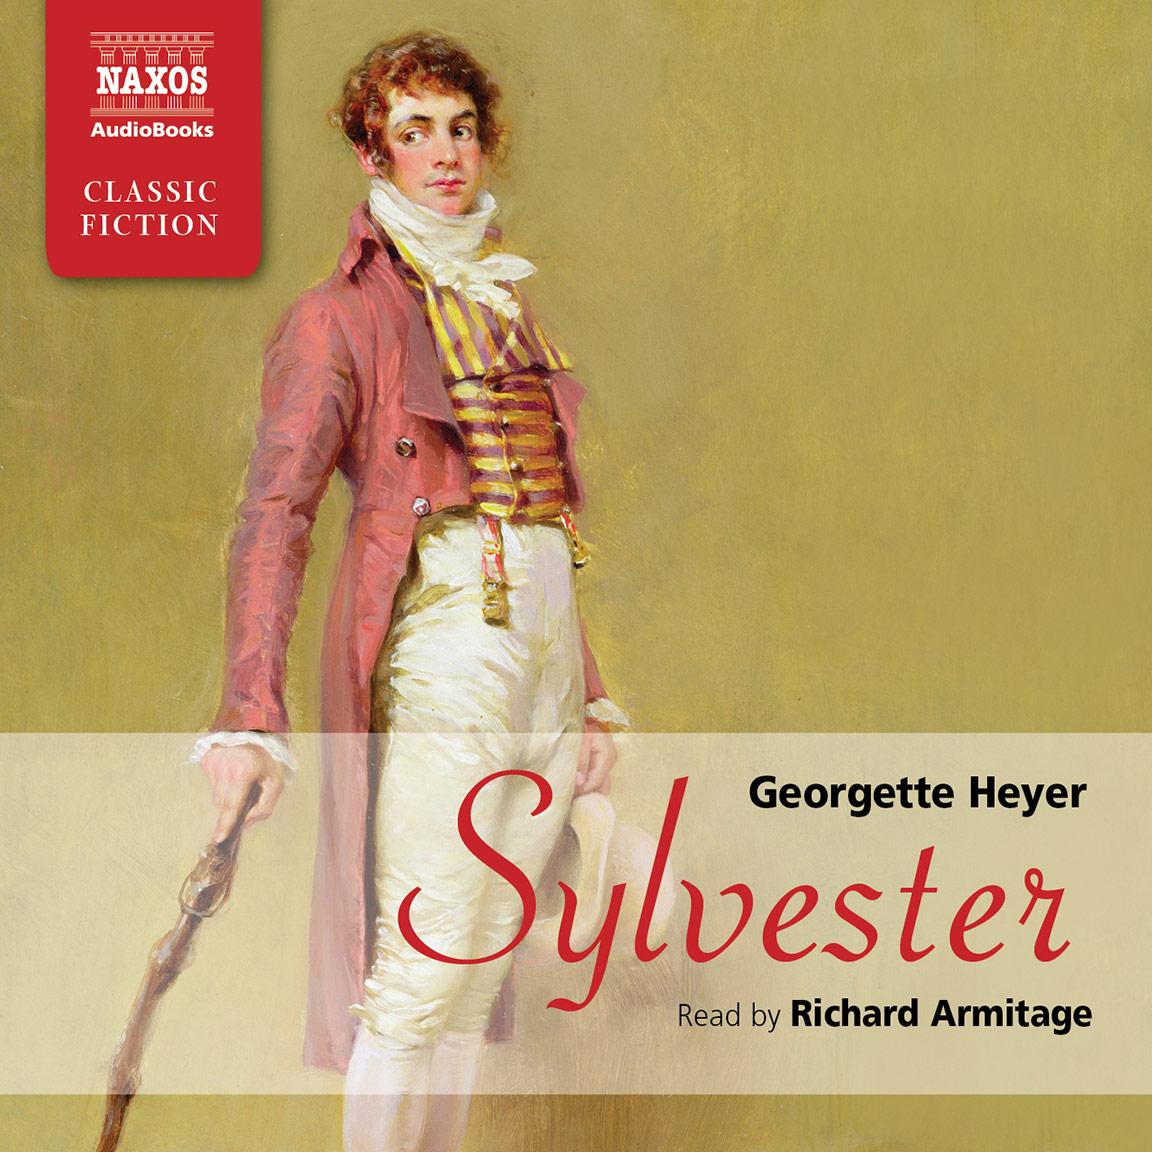 Sylvester (abridged)